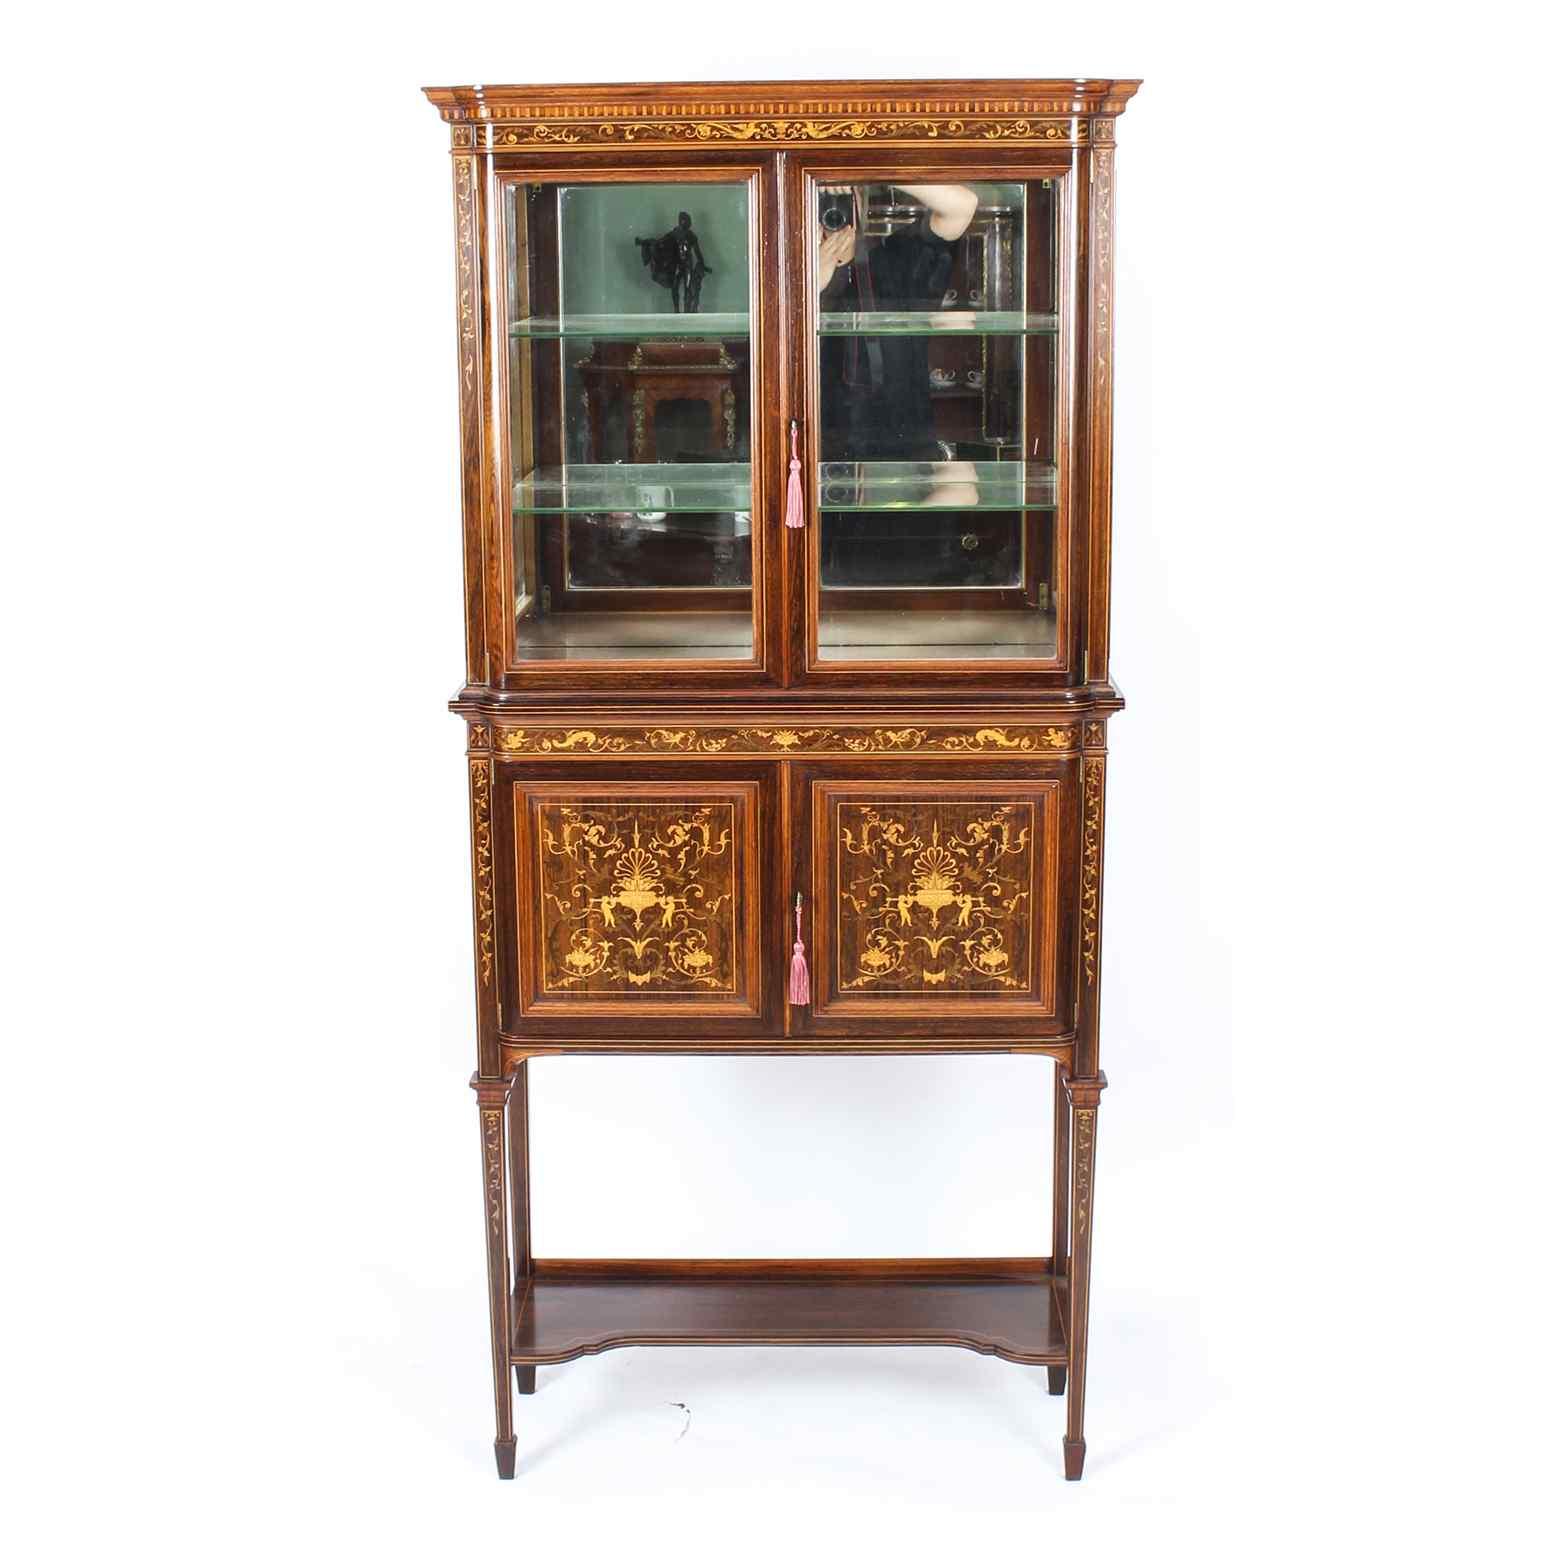 Antique Edwardian Inlaid Display Cabinet, Edwards & Roberts